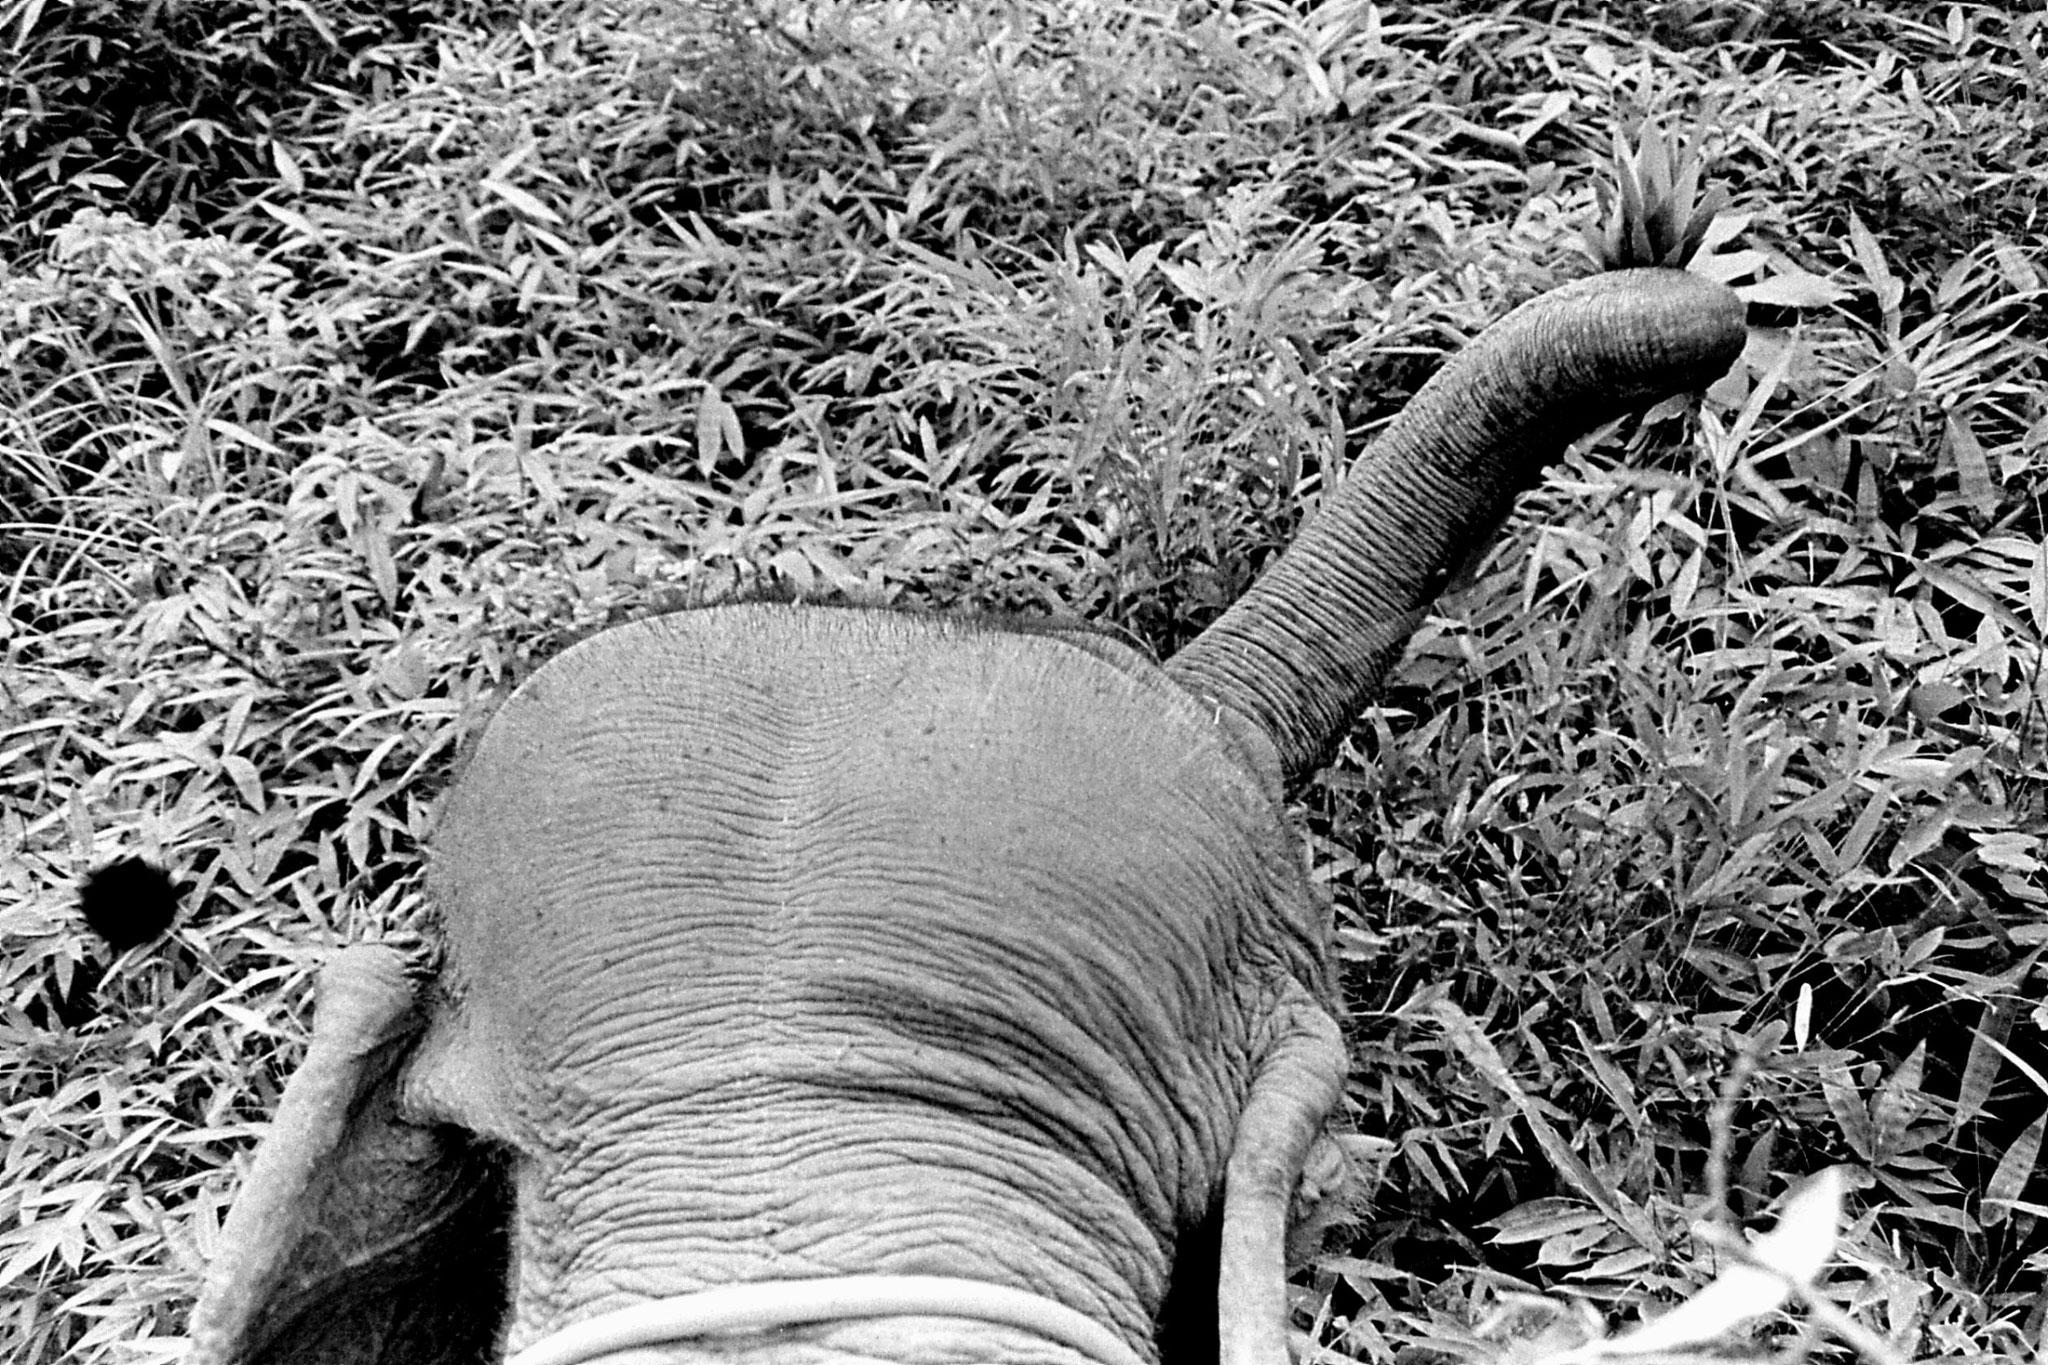 13/6/1990: 28: Last day of Trek, on elephant